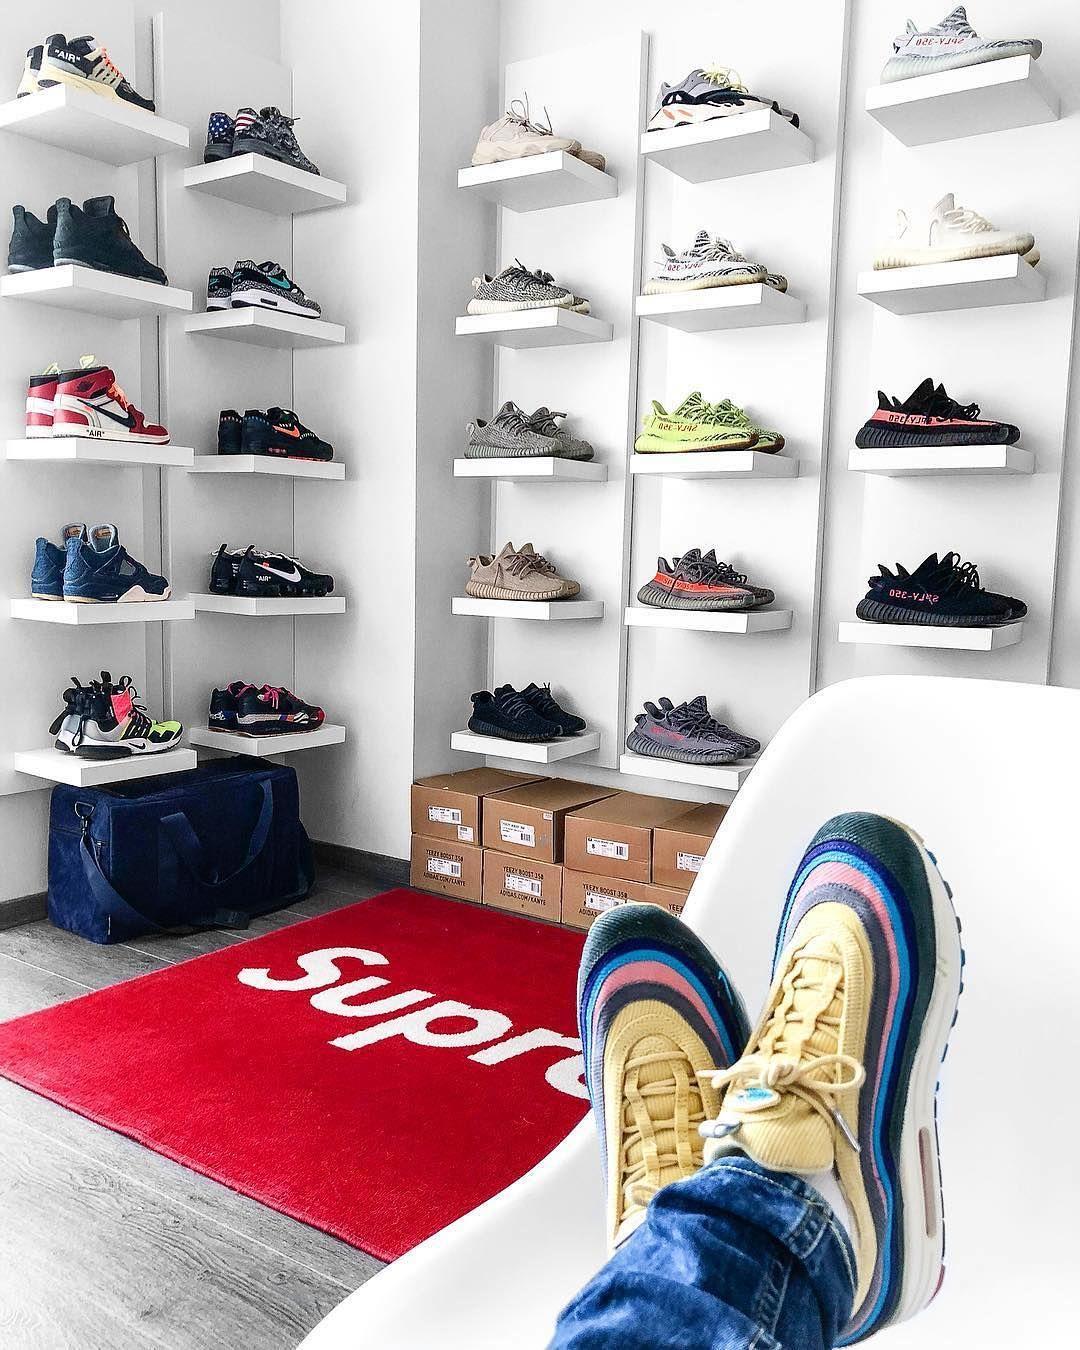 marketplace de sneakers rares